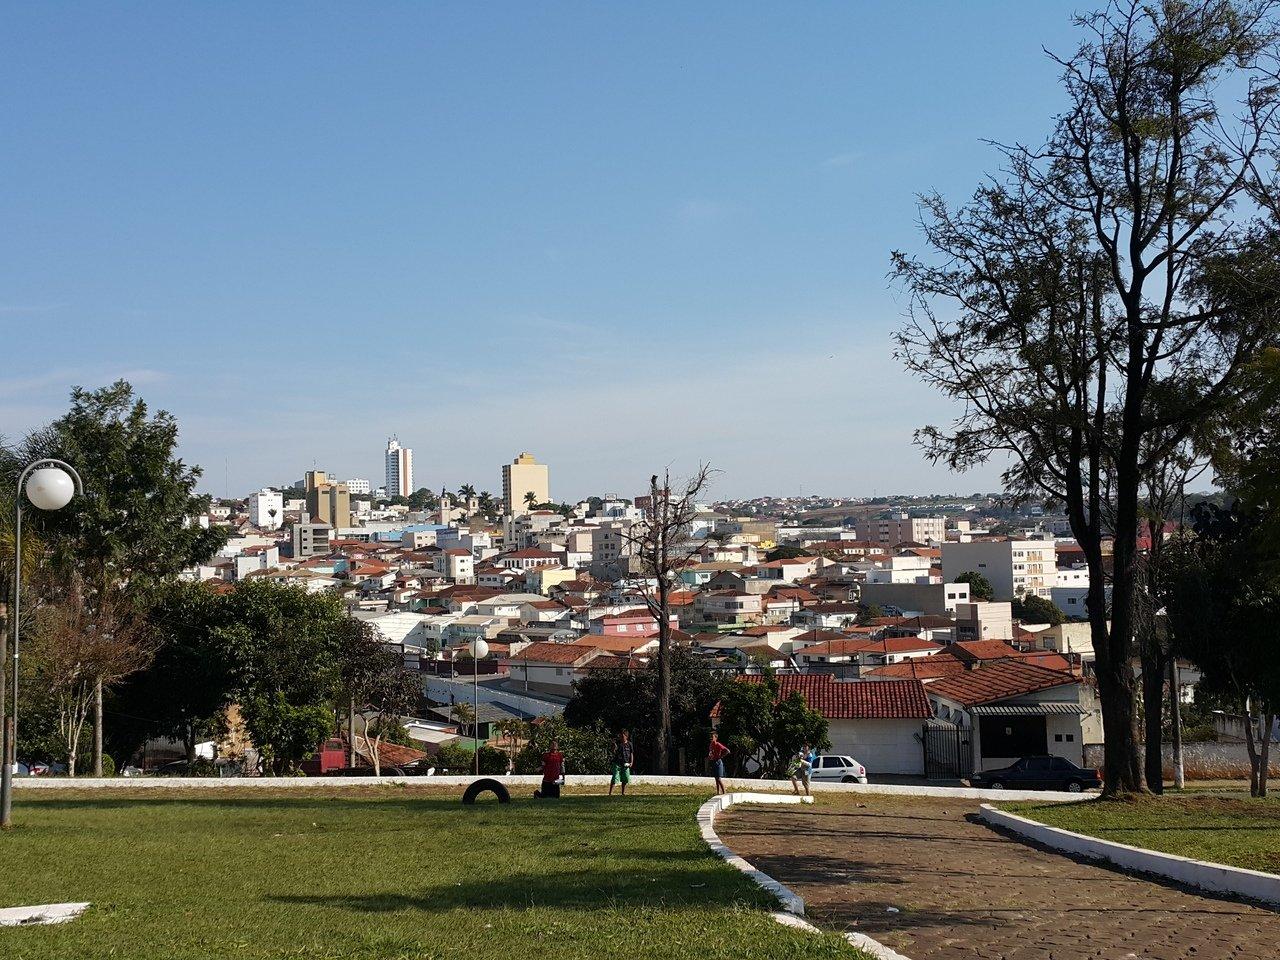 Vista de Itapeva